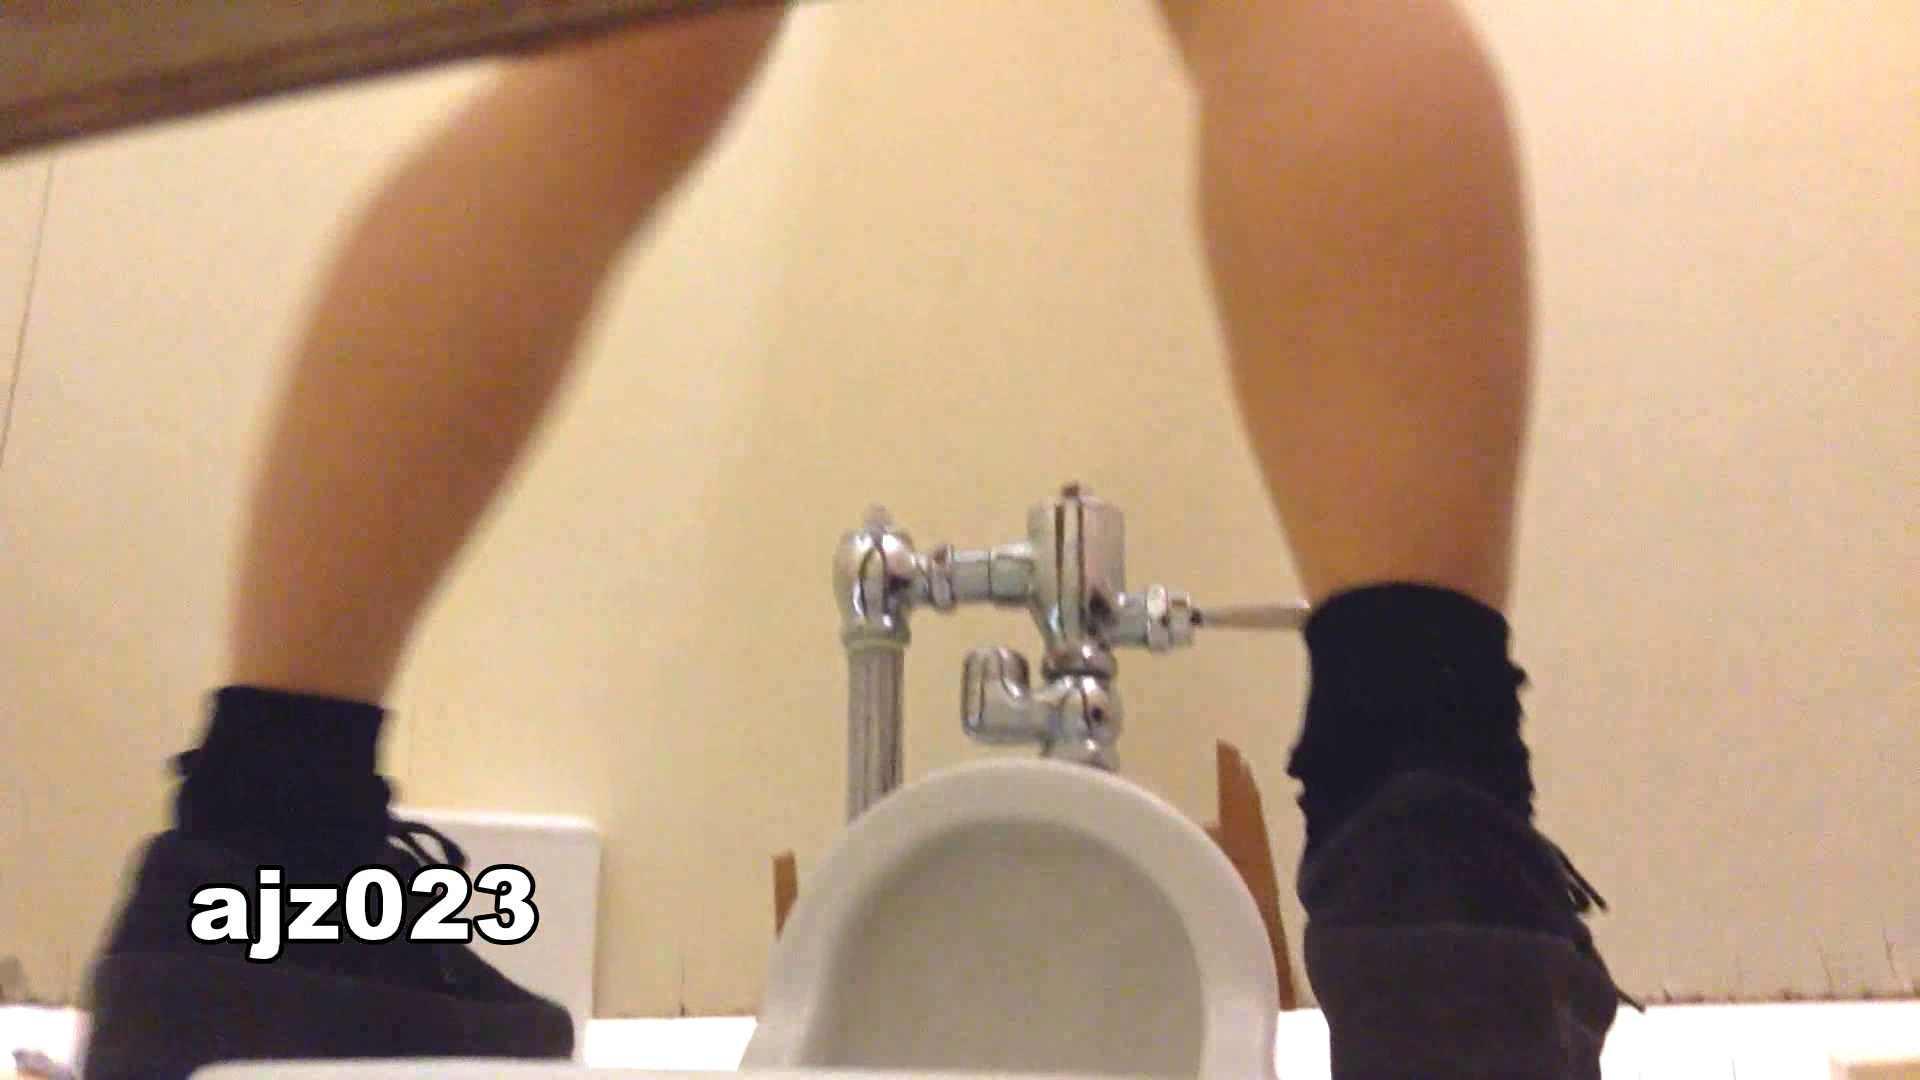 某有名大学女性洗面所 vol.23 洗面所 隠し撮りオマンコ動画紹介 101画像 23